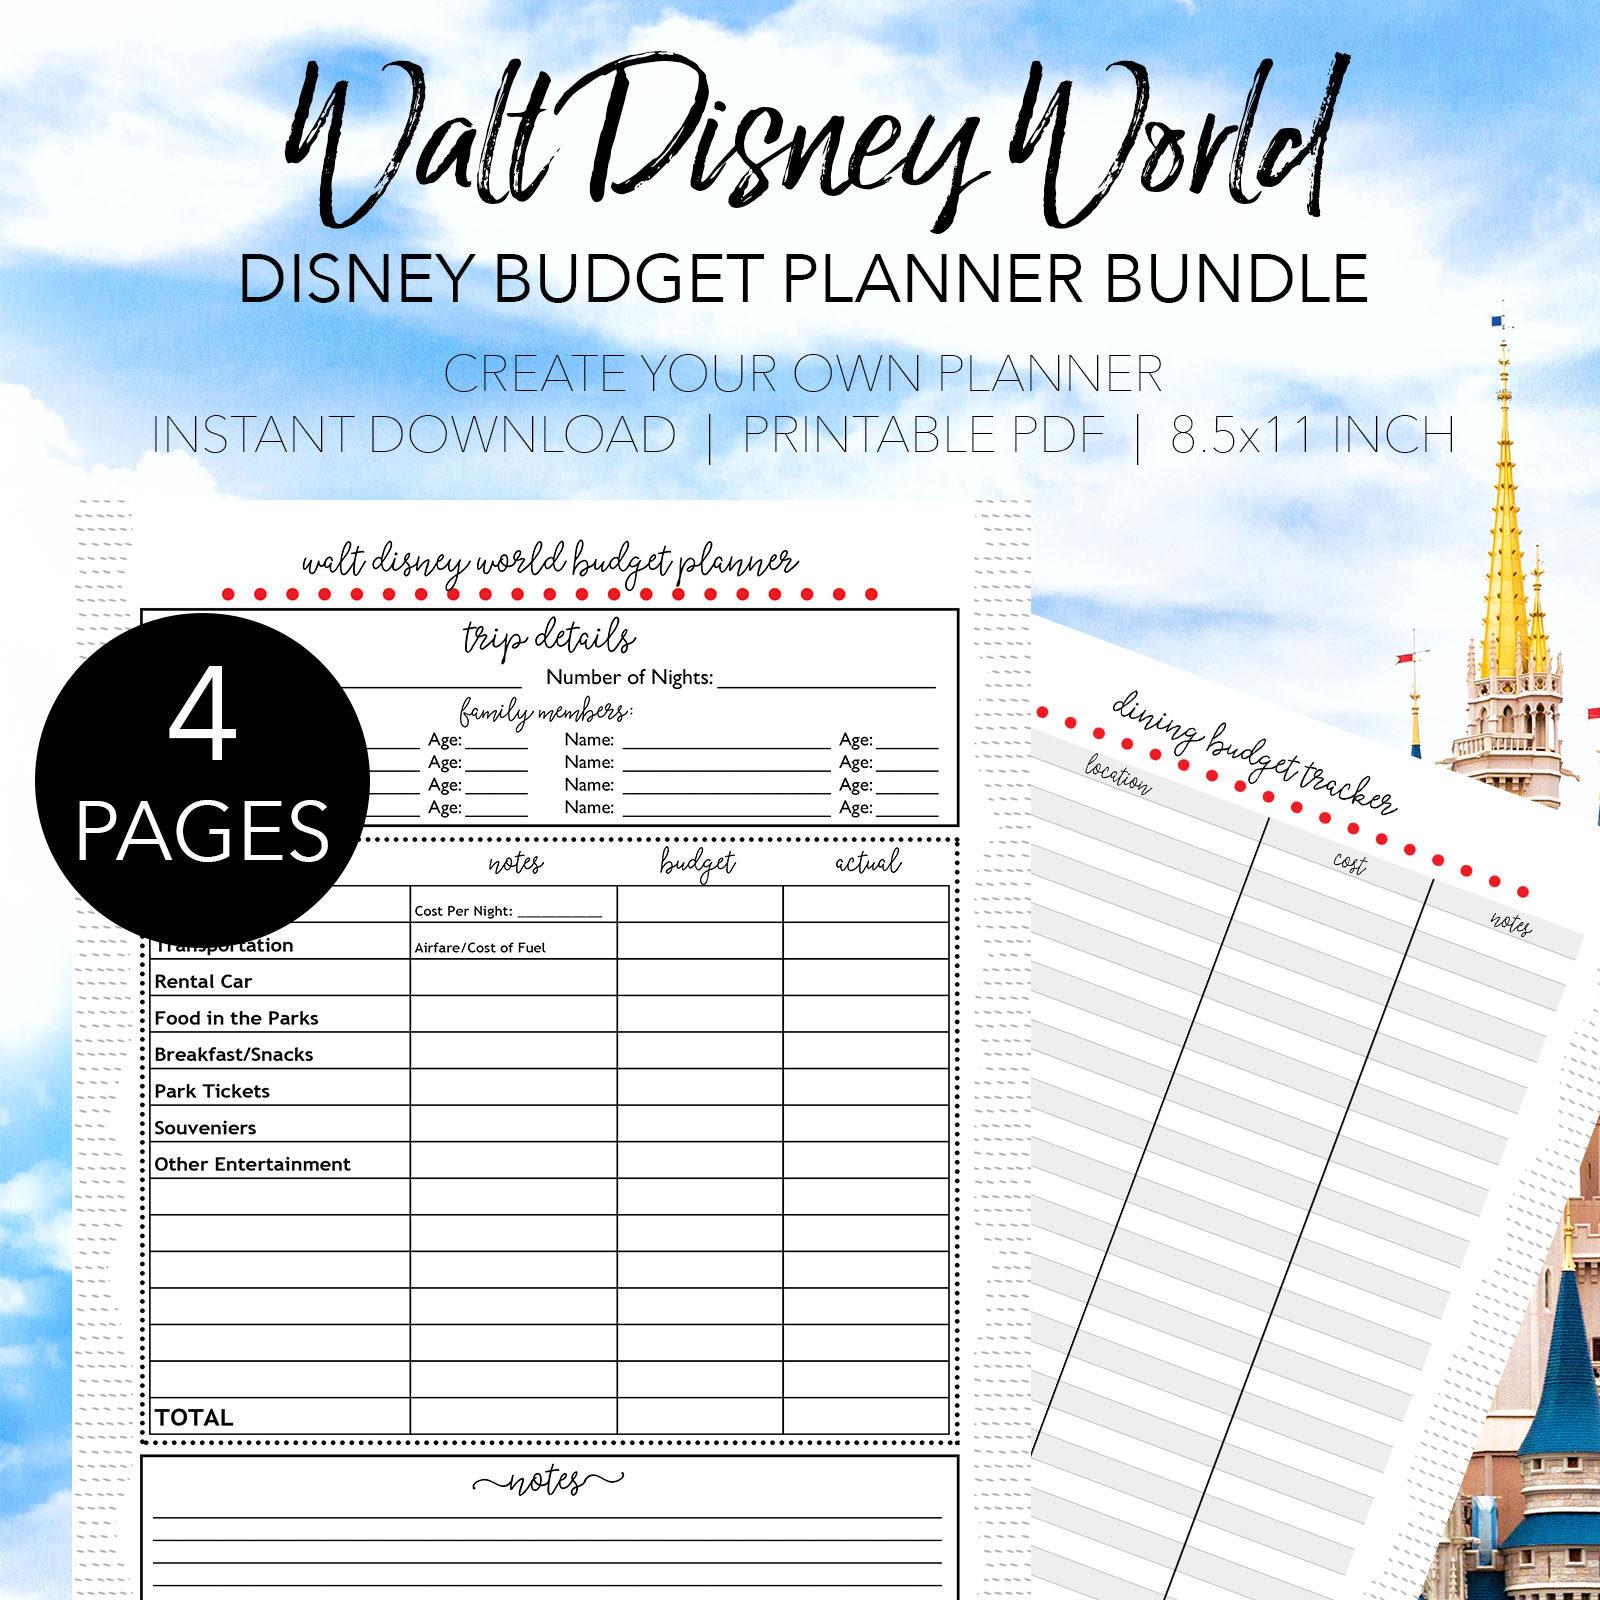 Disney World Ultimate Budget Planner Print Your Own Disney